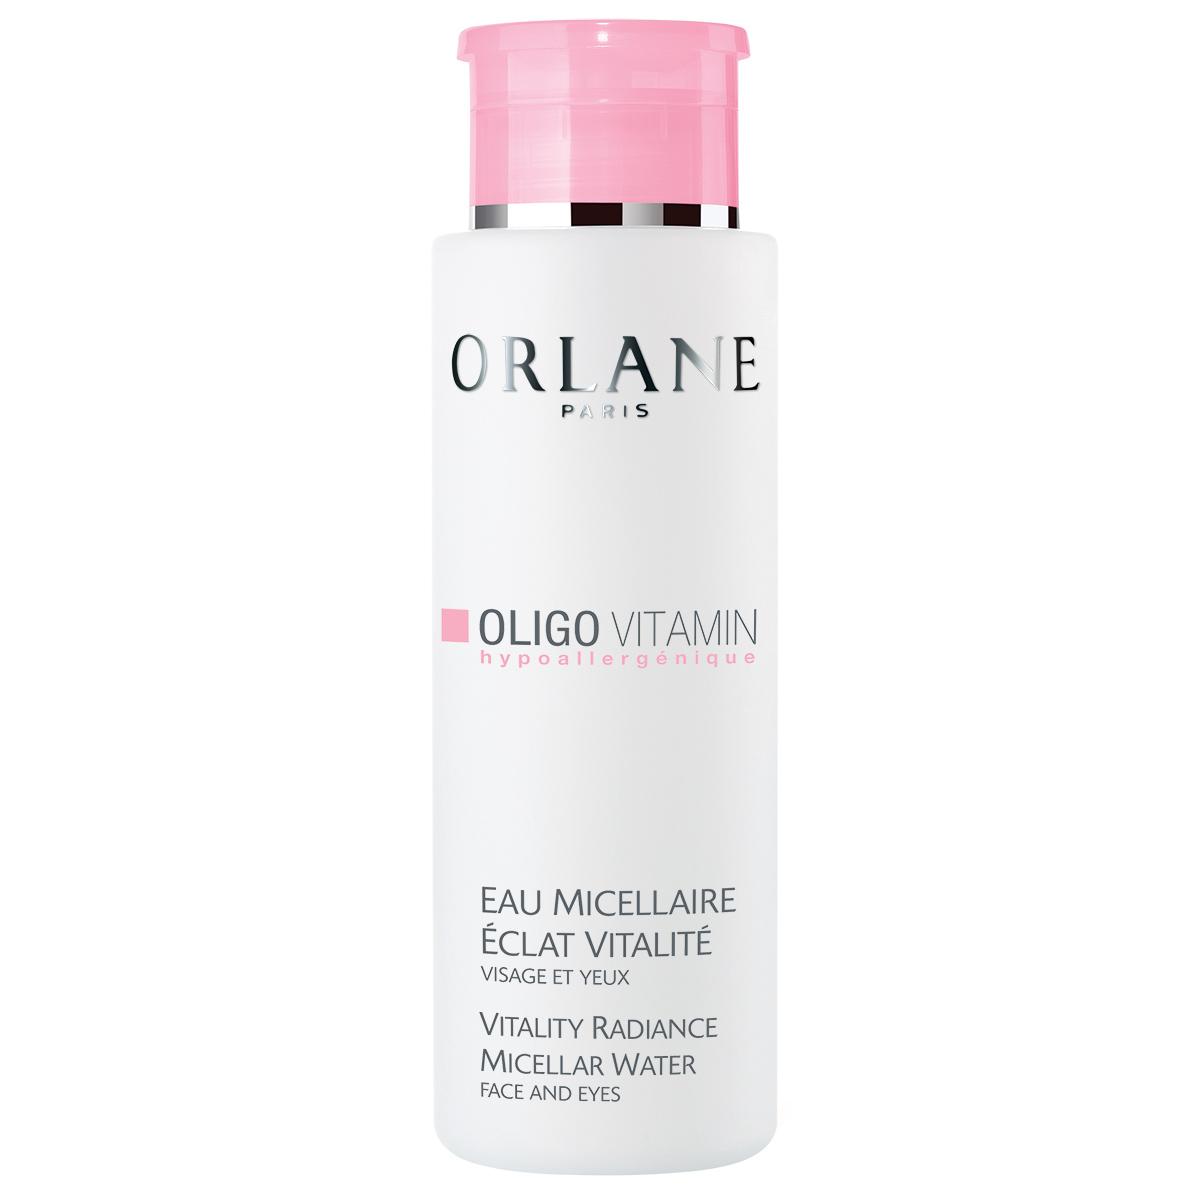 Orlane - Oligo Vitamin - Eau Micellaire